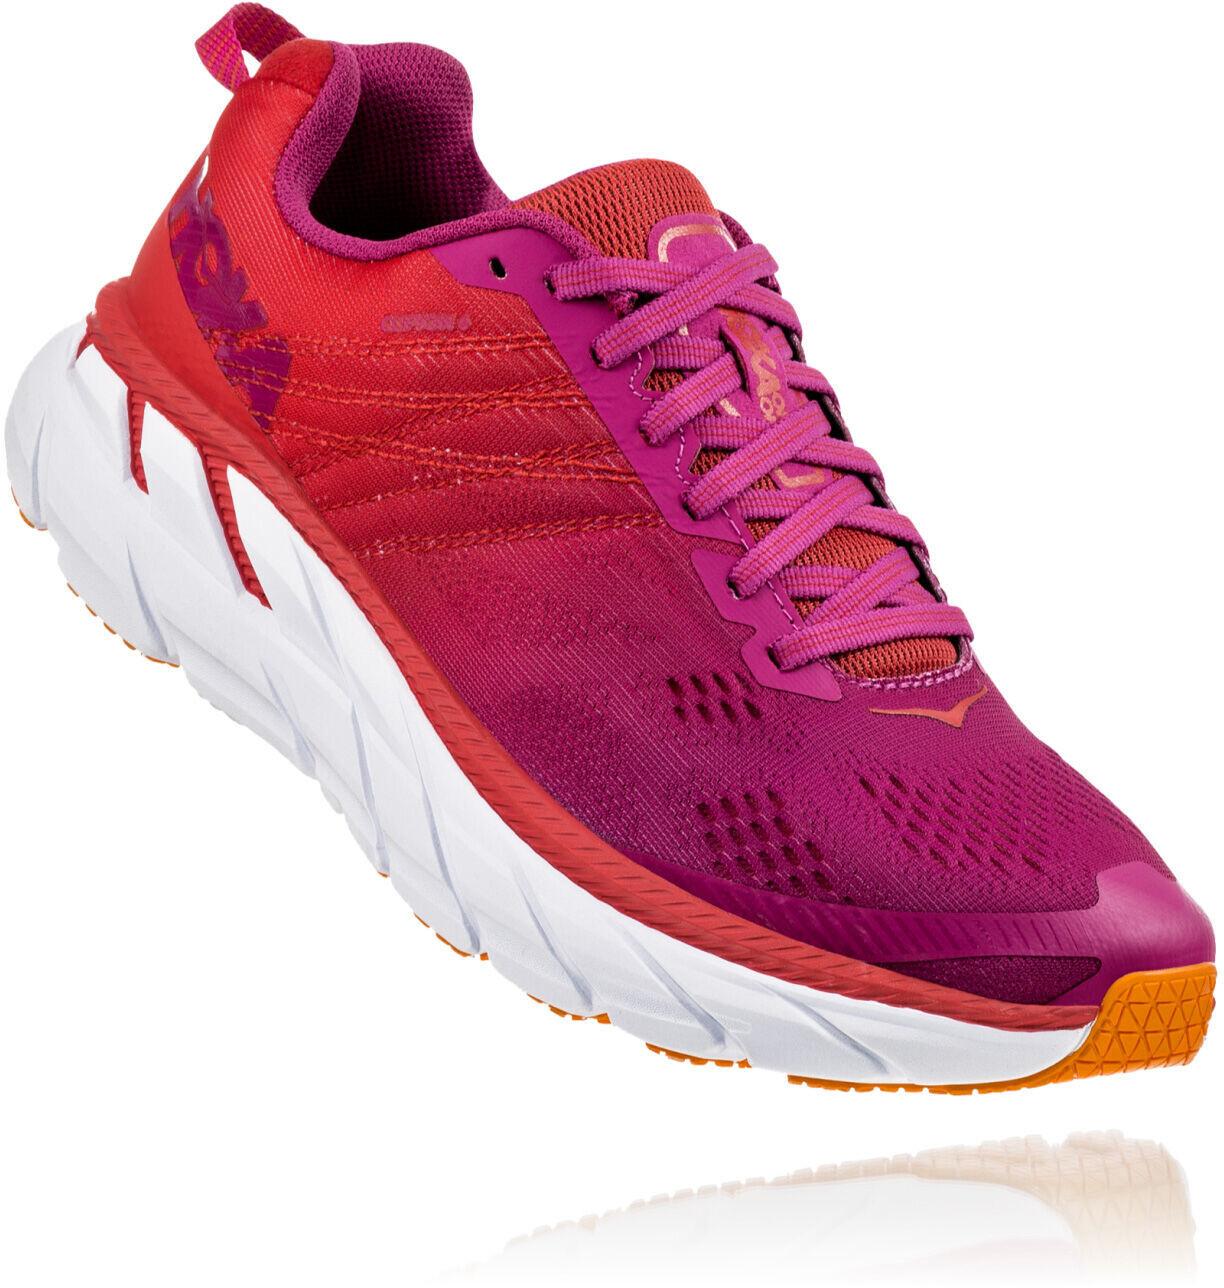 Hoka One One Clifton 6 Running Shoes Women poppy redcactus flower